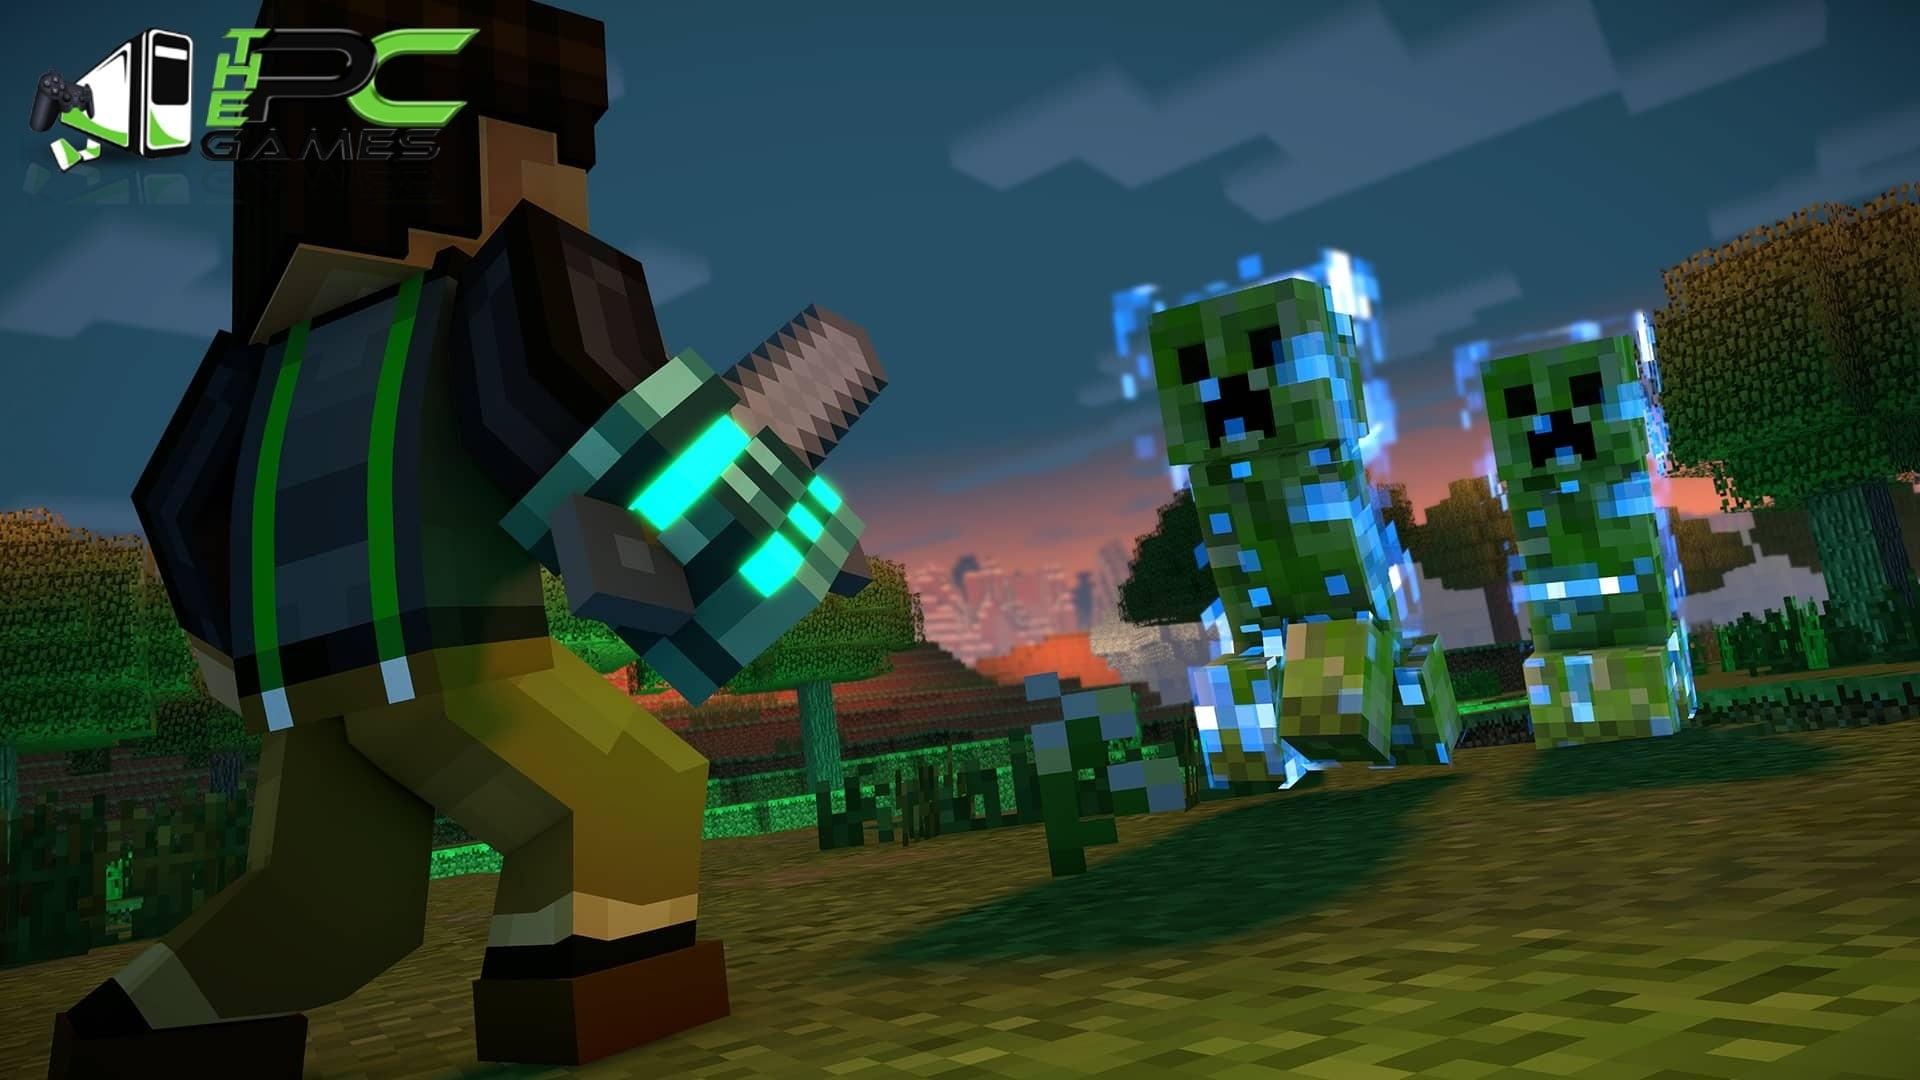 Meteors Falling Wallpaper Minecraft Story Mode Season Two Episode 1 Pc Game Free